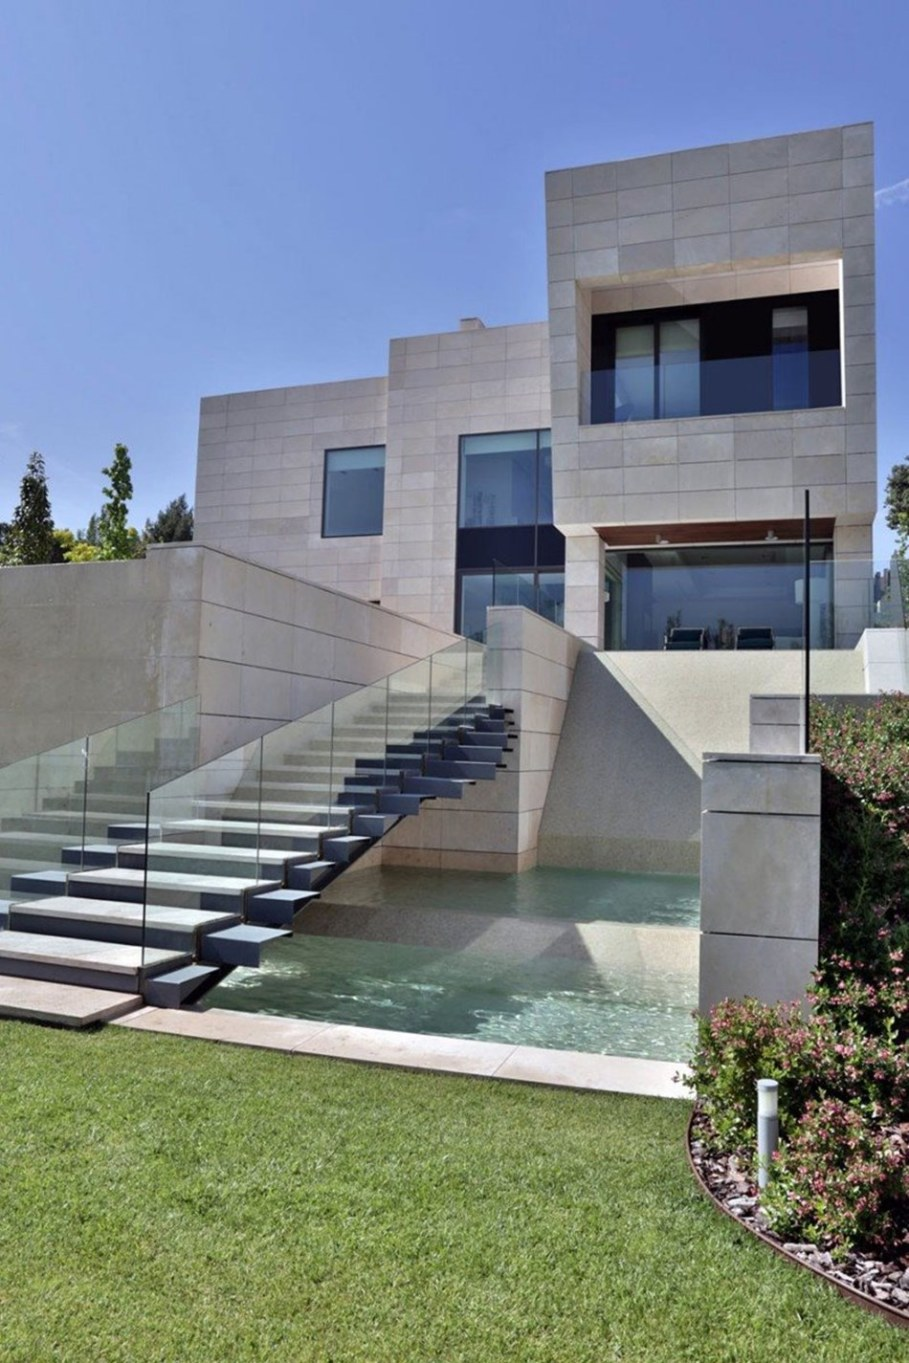 A modern villa in Spain - the main entrance